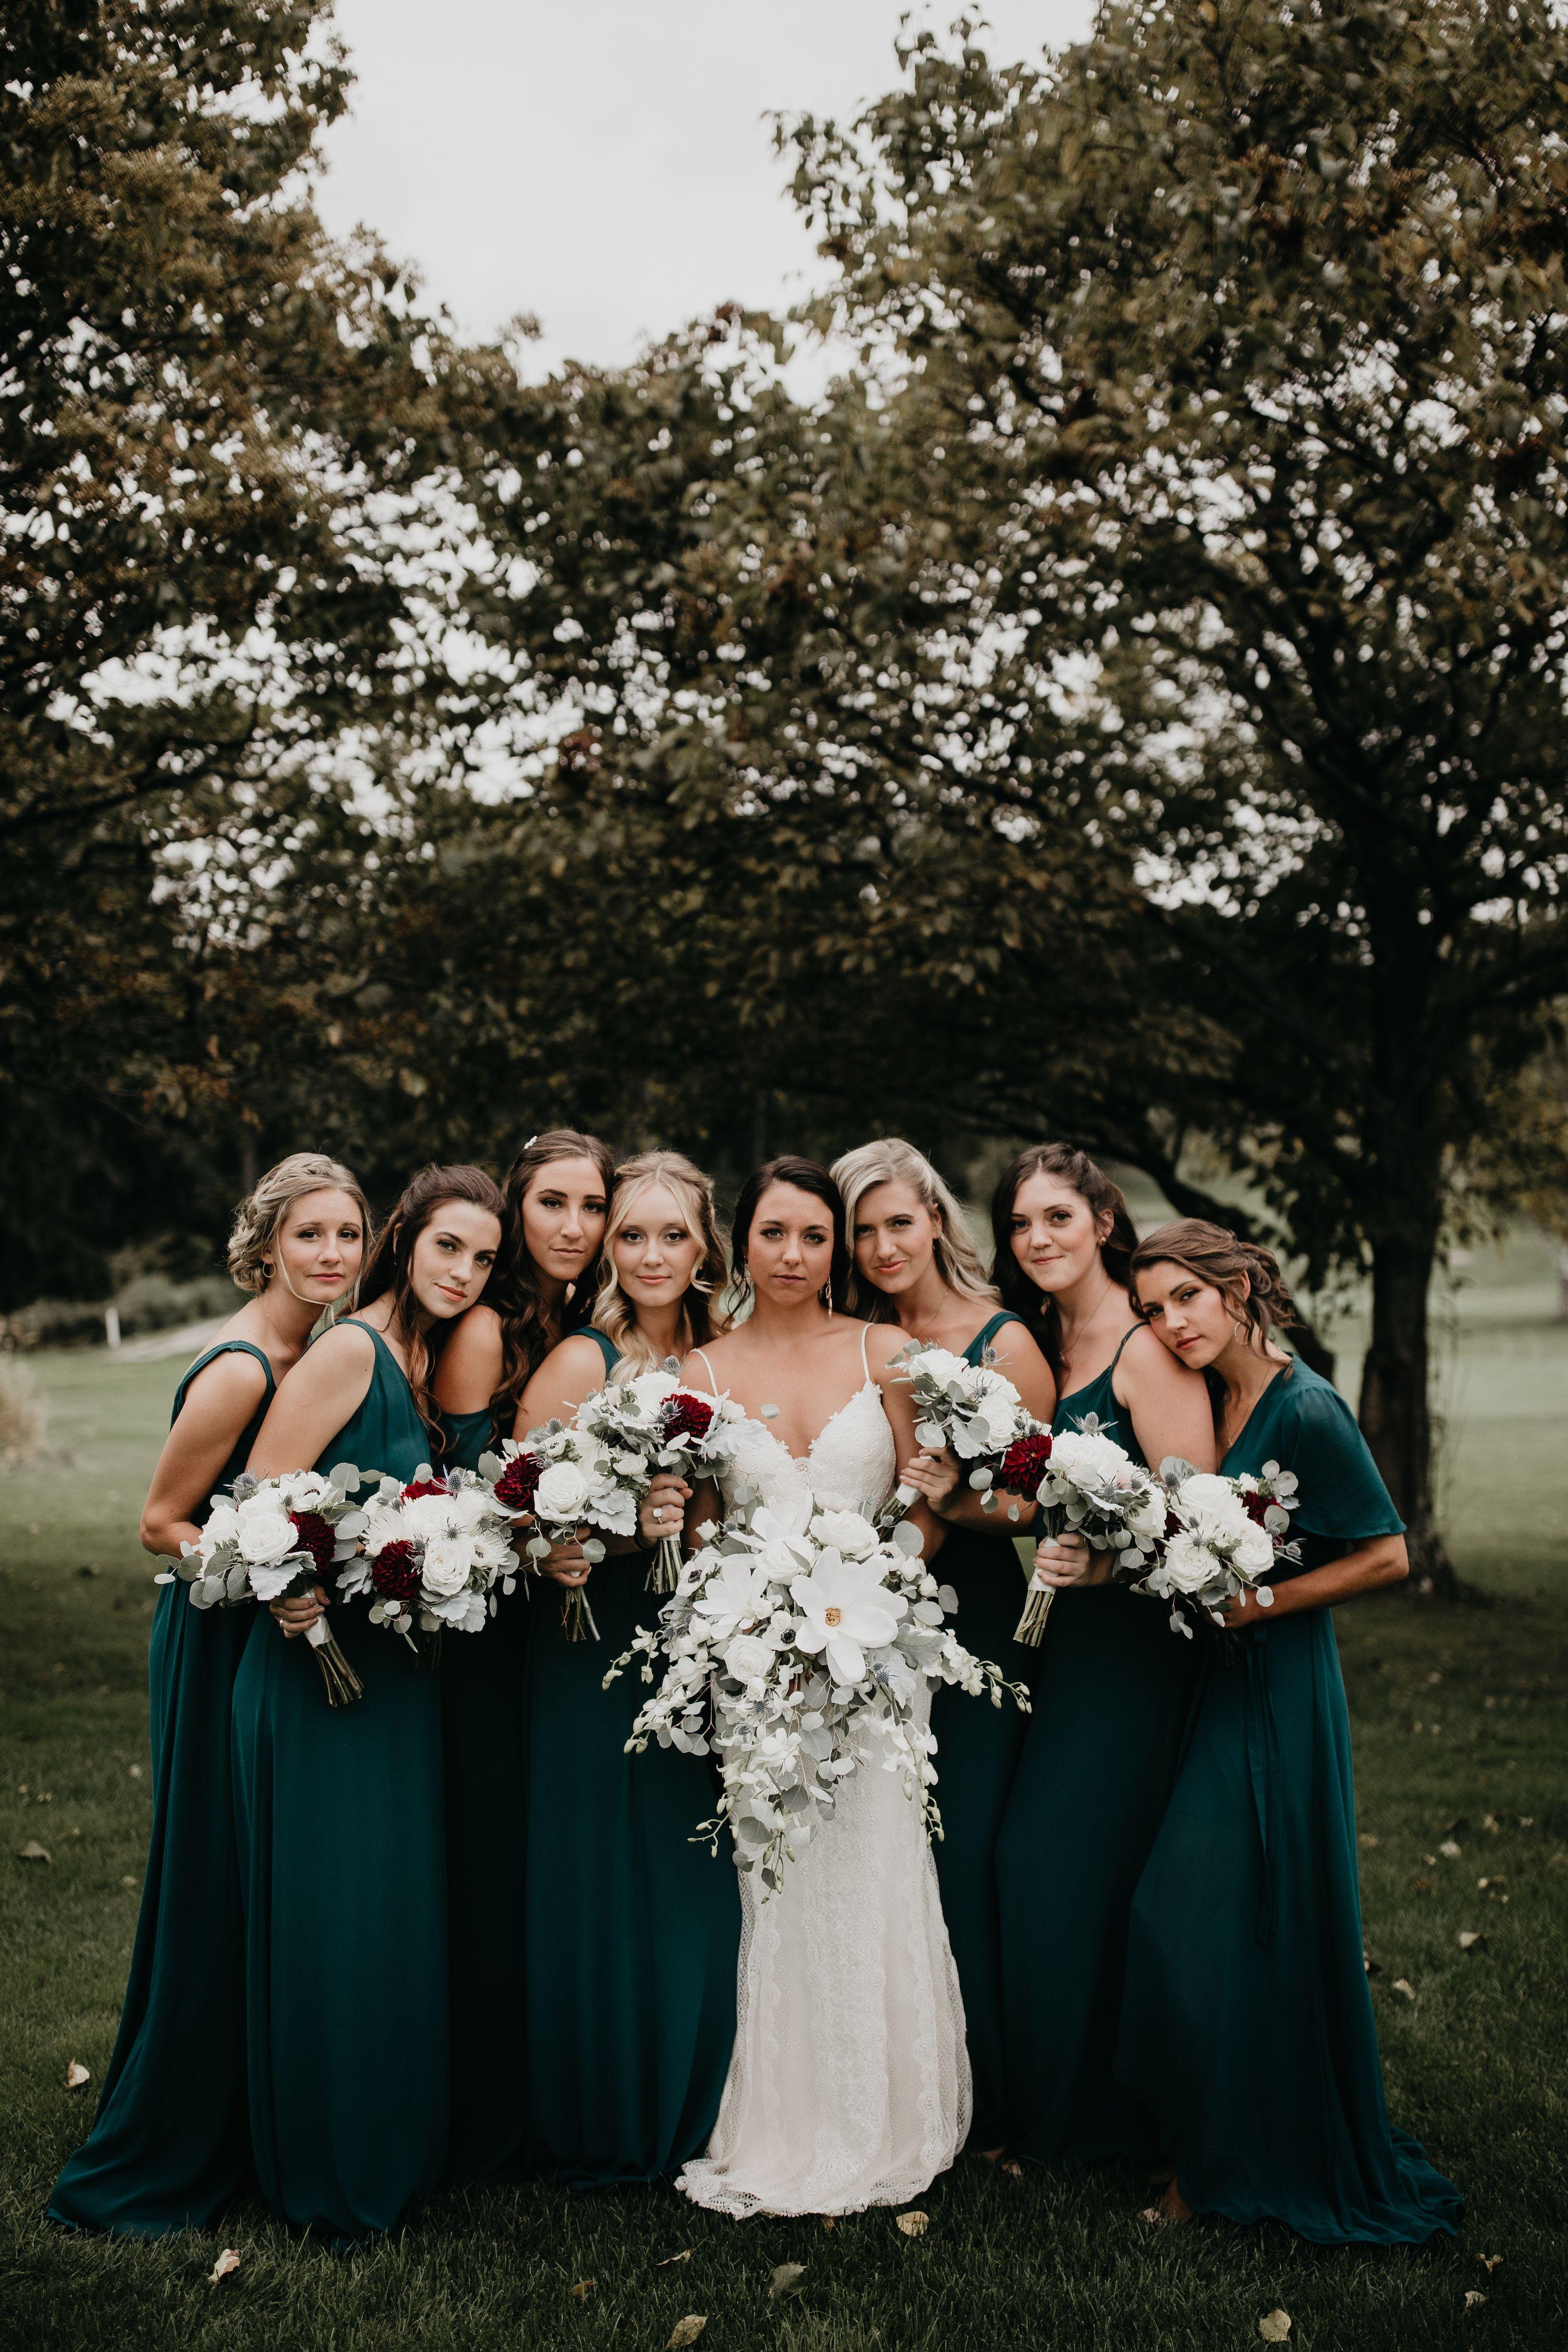 Www Rachelrowland Com Www Instagram Com Rachelrowlandphotography Co Emerald Green Bridesmaid Dresses Forest Green Bridesmaid Dresses Emerald Bridesmaid Dresses